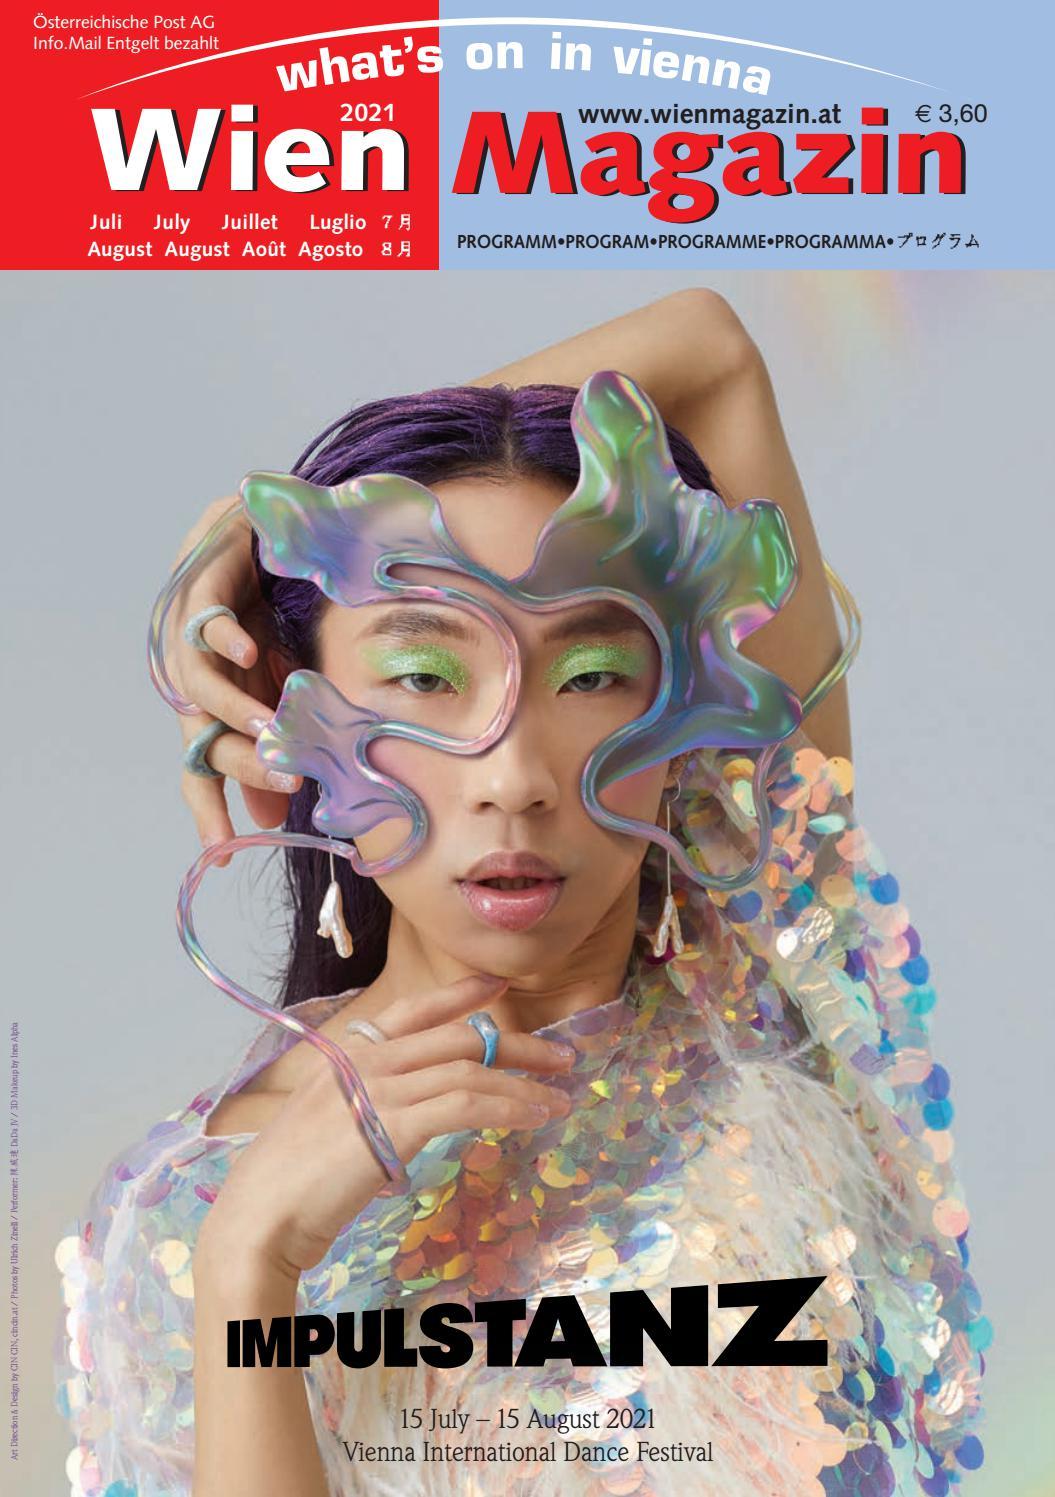 Wien Magazin 8 8 8 by Waltraud Edelmayer   issuu